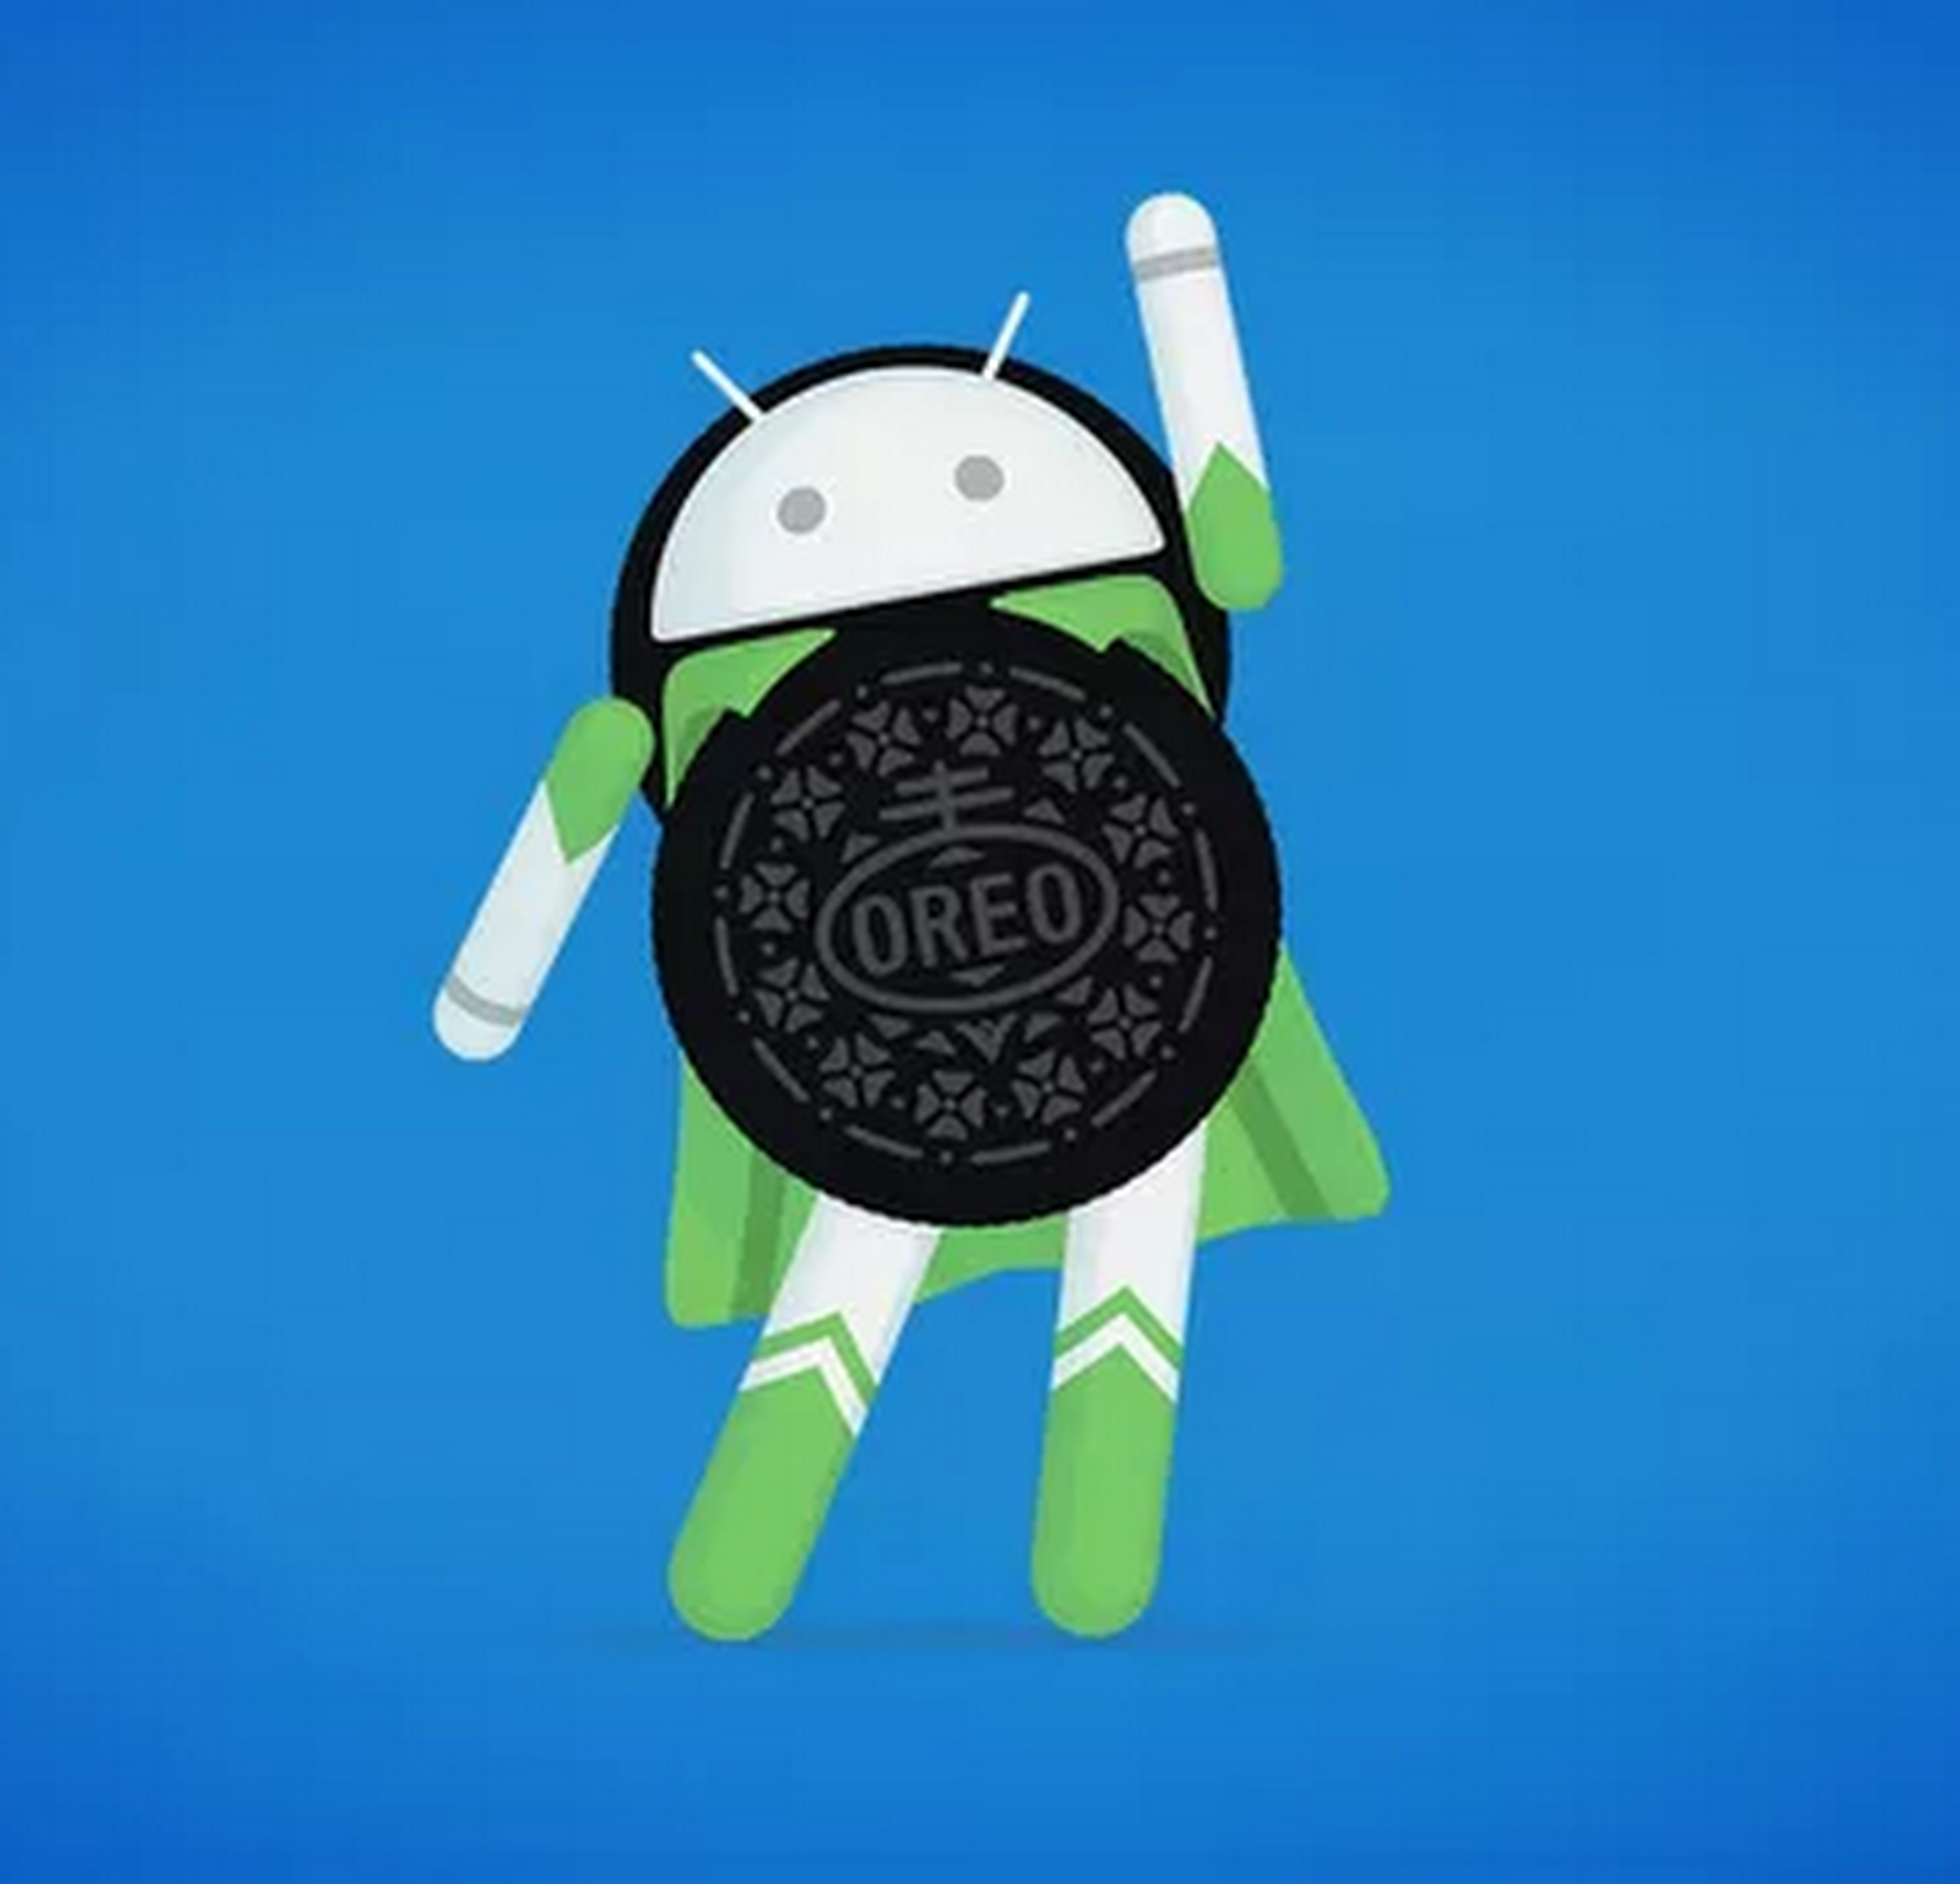 Android 8.0 Oreo for enterprise